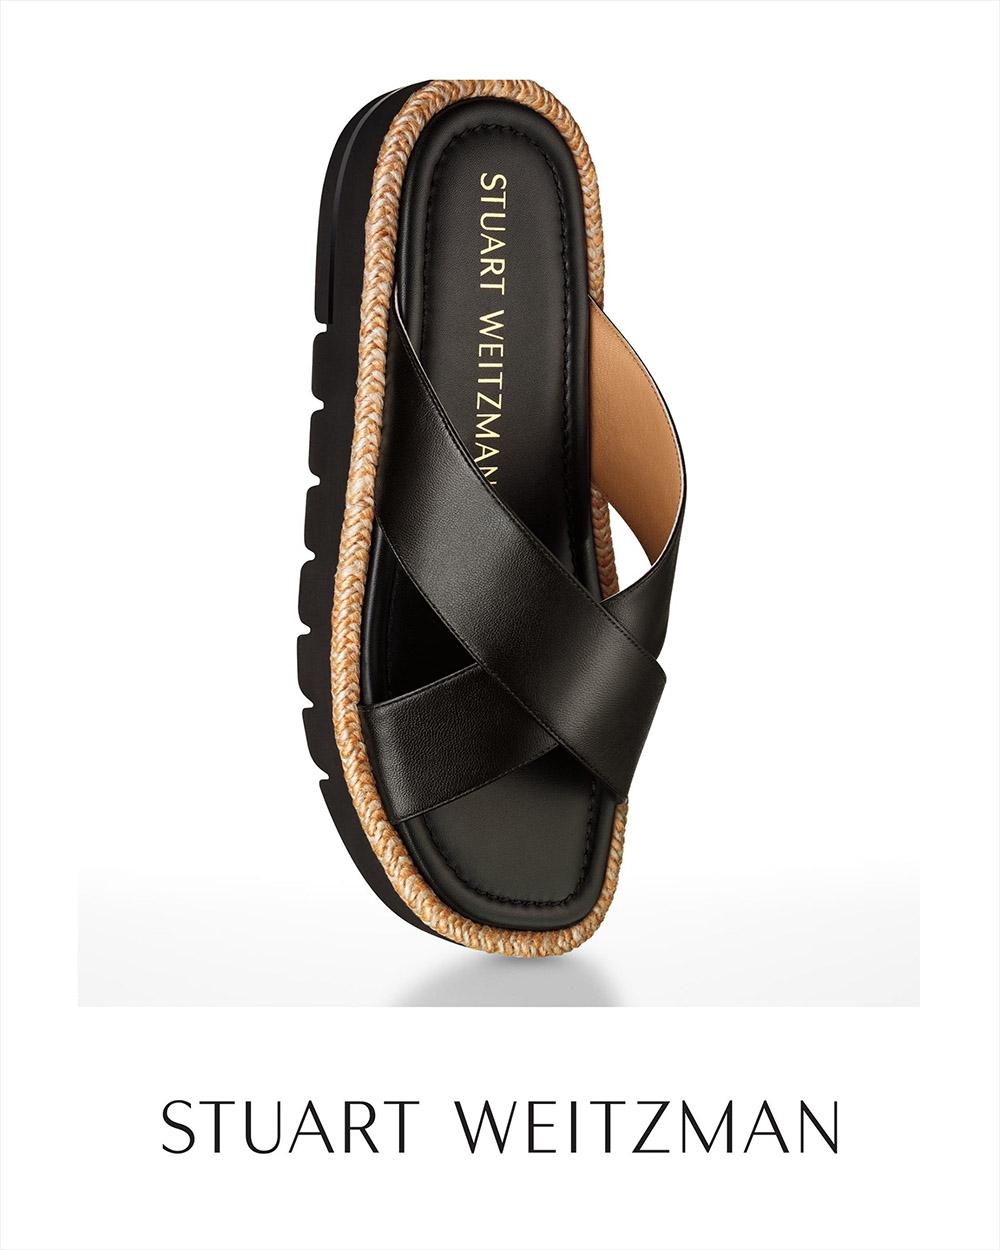 Stuart Weitzman Spring Summer 2021 Campaign